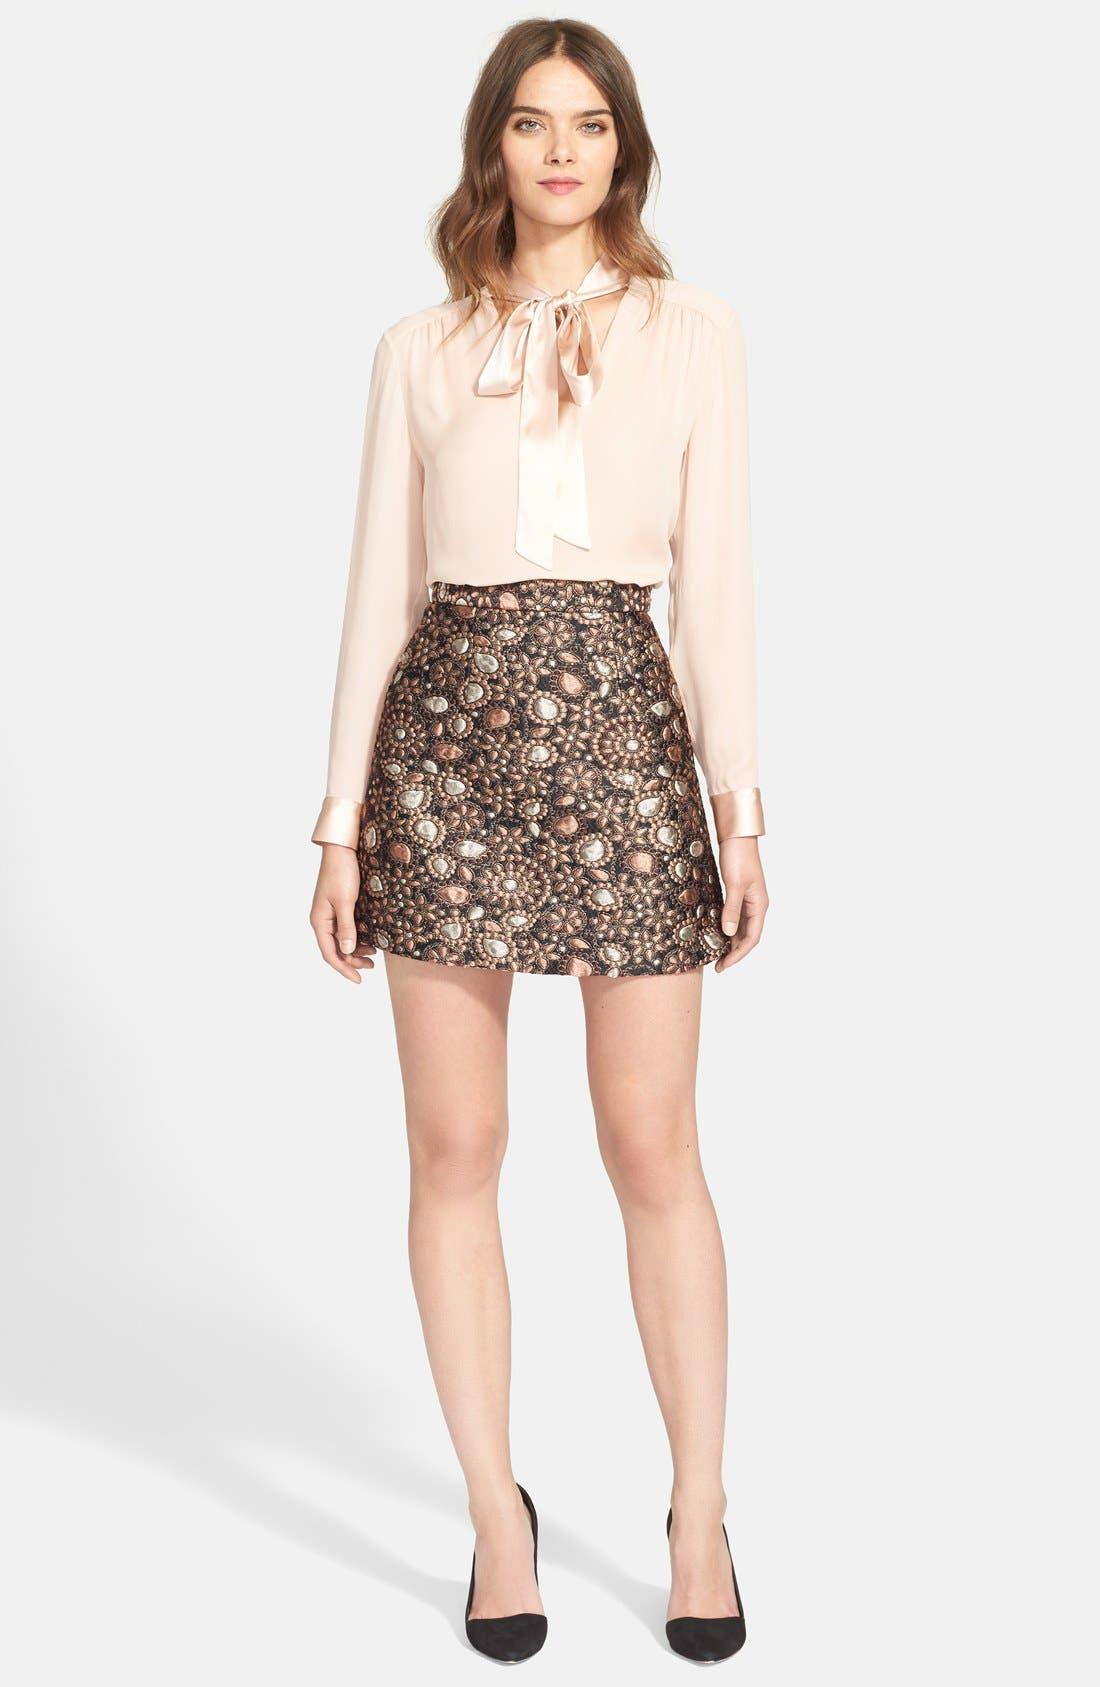 ALICE + OLIVIA, 'Jessa' A-Line Skirt, Alternate thumbnail 4, color, 716